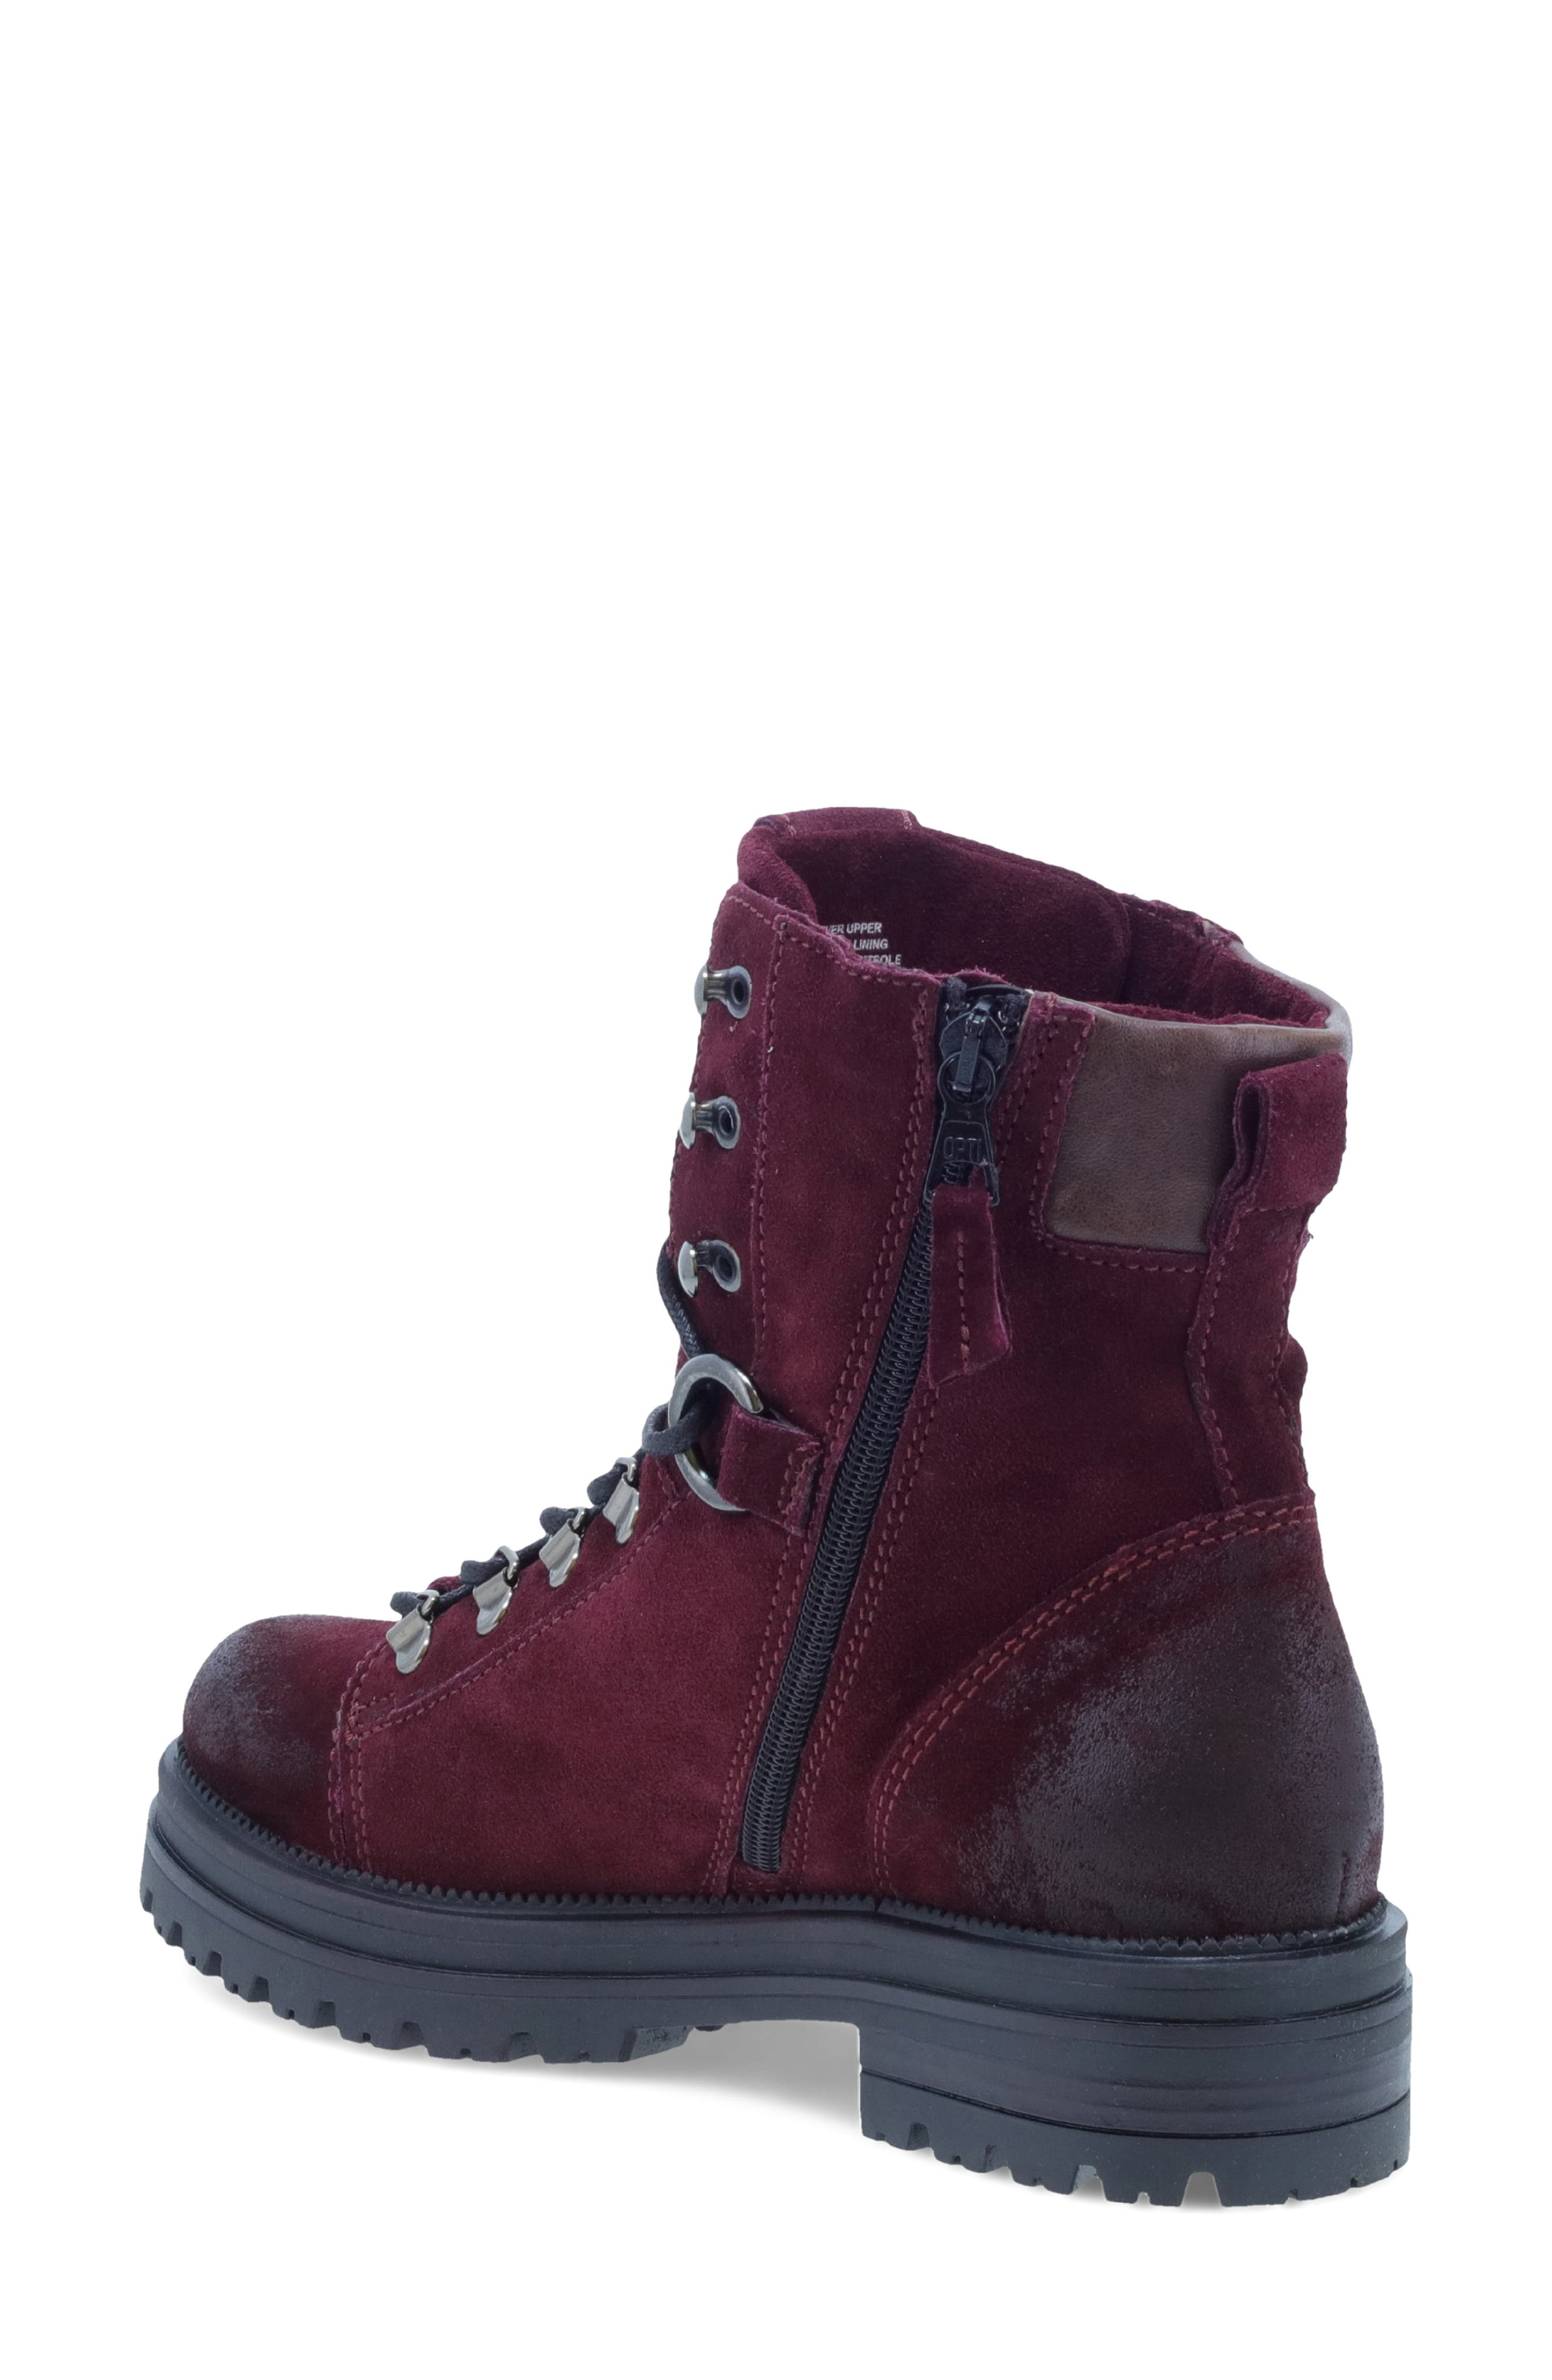 Image of Miz Mooz Dunn Lace-Up Boot